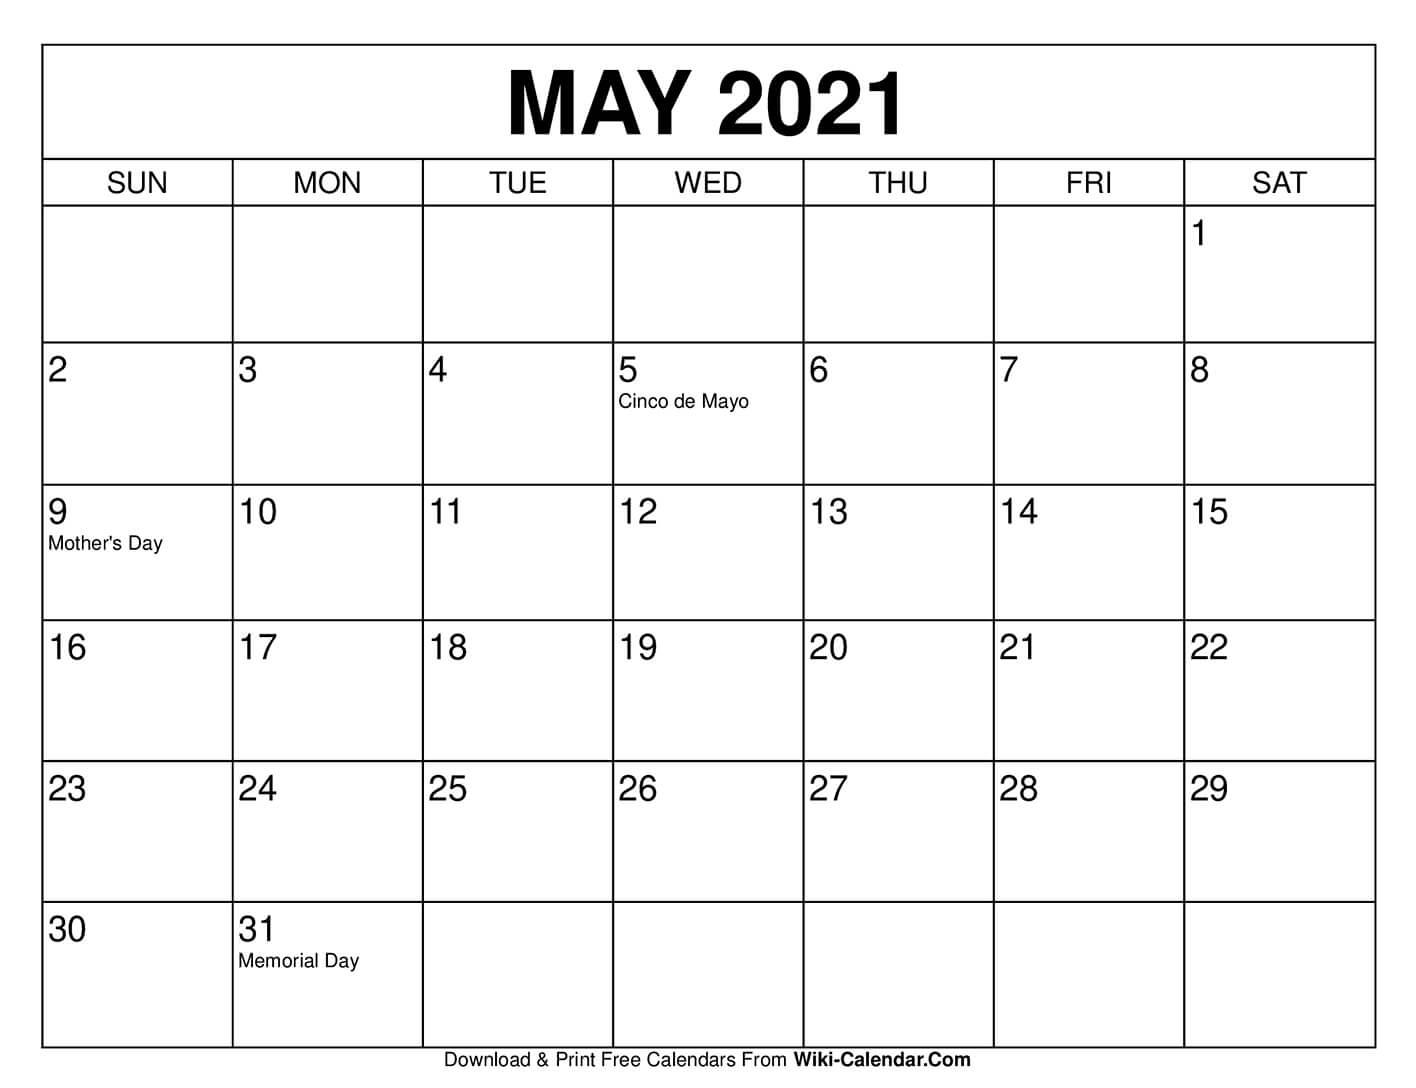 Free Printable May 2021 Calendars